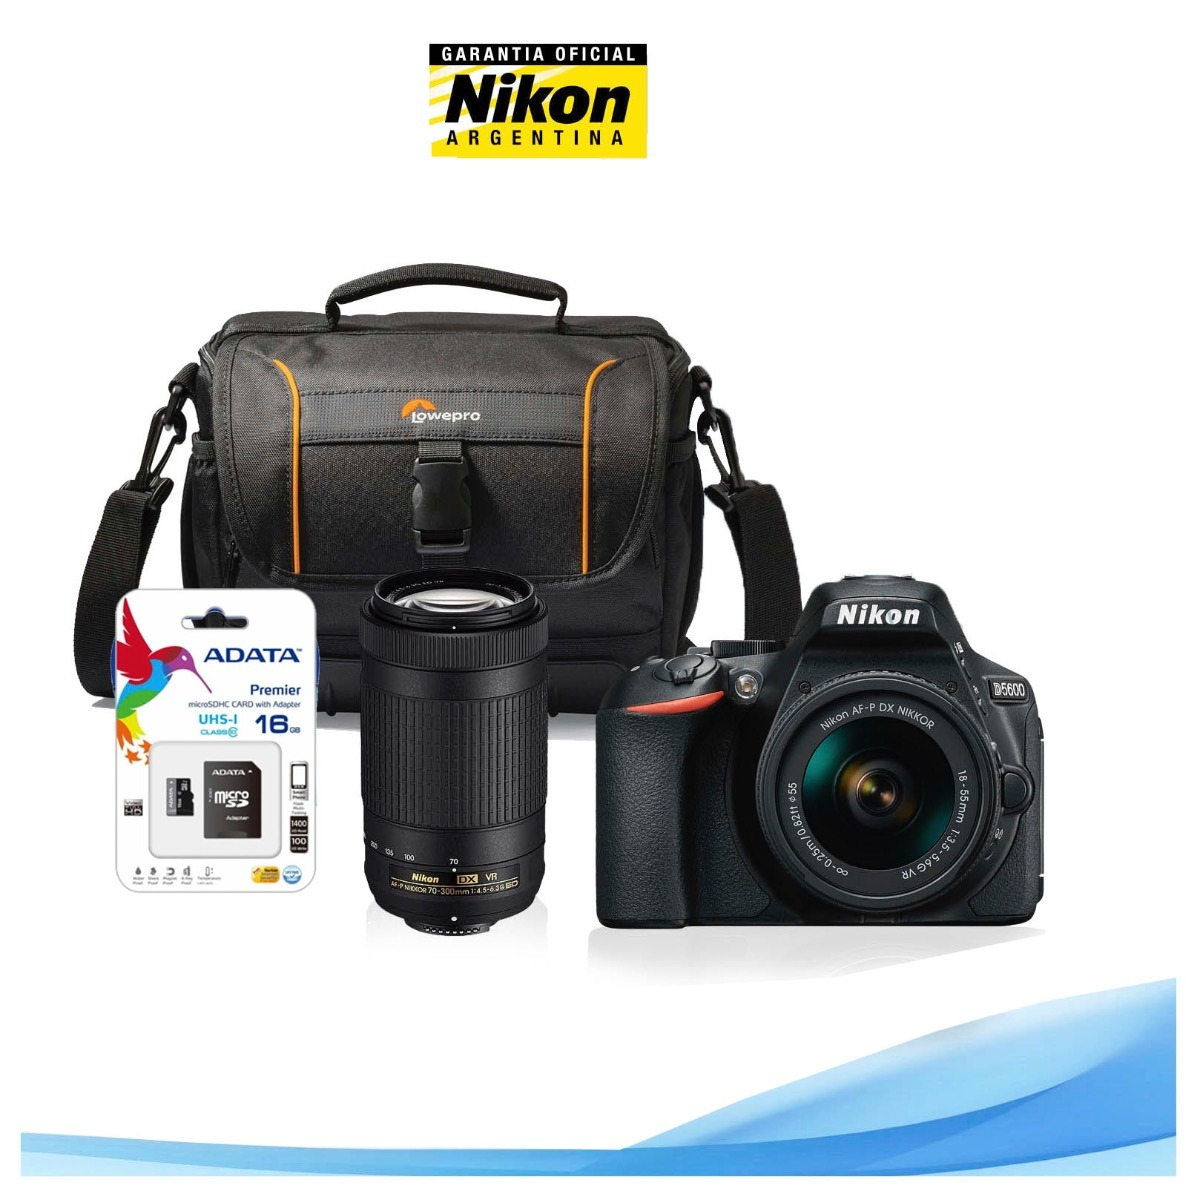 Nikon D5600 Kit 18 55 70 300 Bolso Memoria 16gb 5722800 En 55mm Vr Cargando Zoom